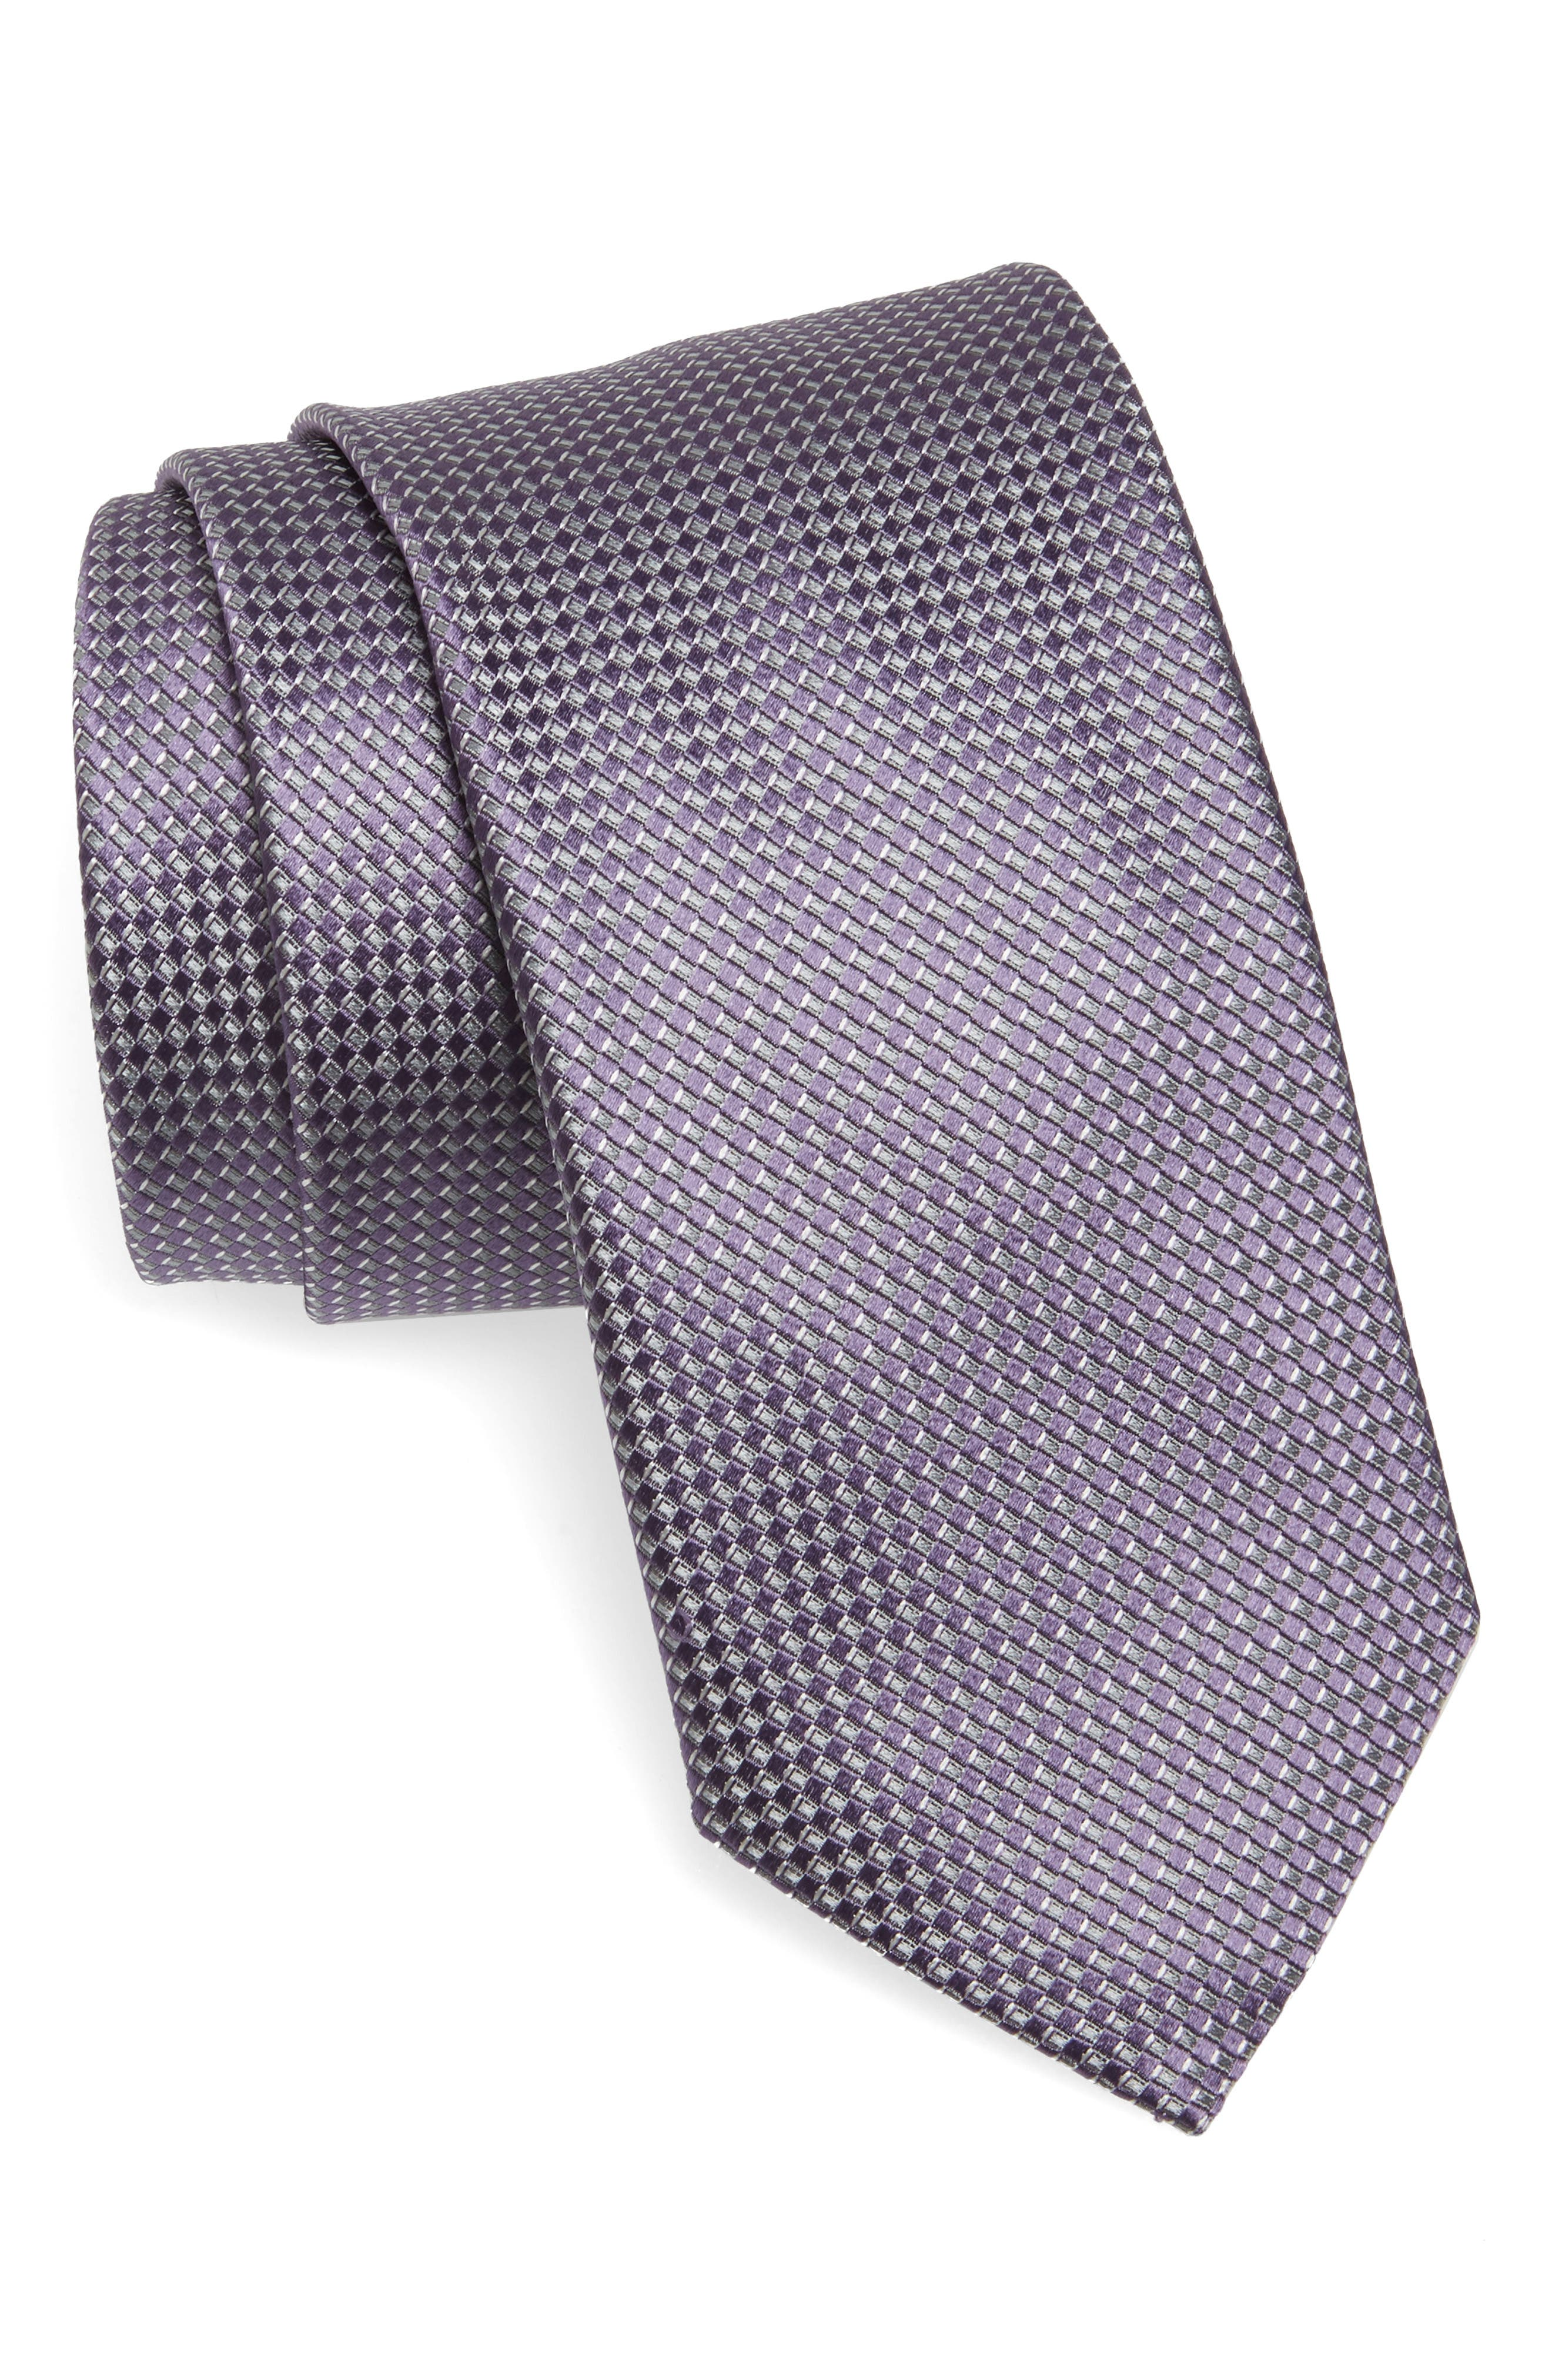 Main Image - Canali Grid Silk Tie